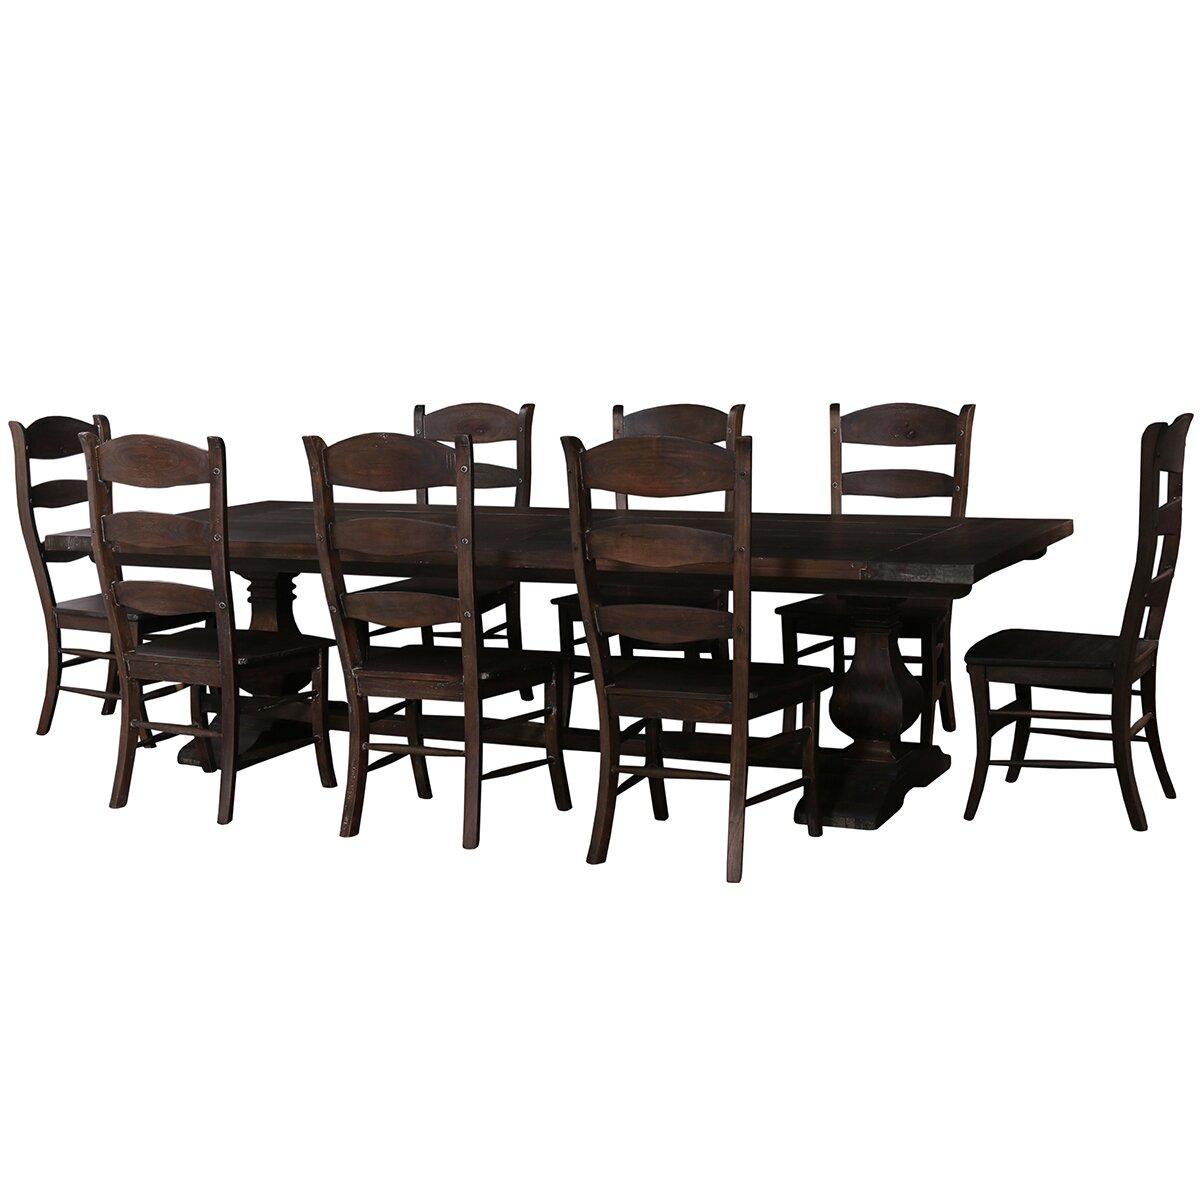 Laurel Foundry Modern Farmhouse Adelle Dining Table